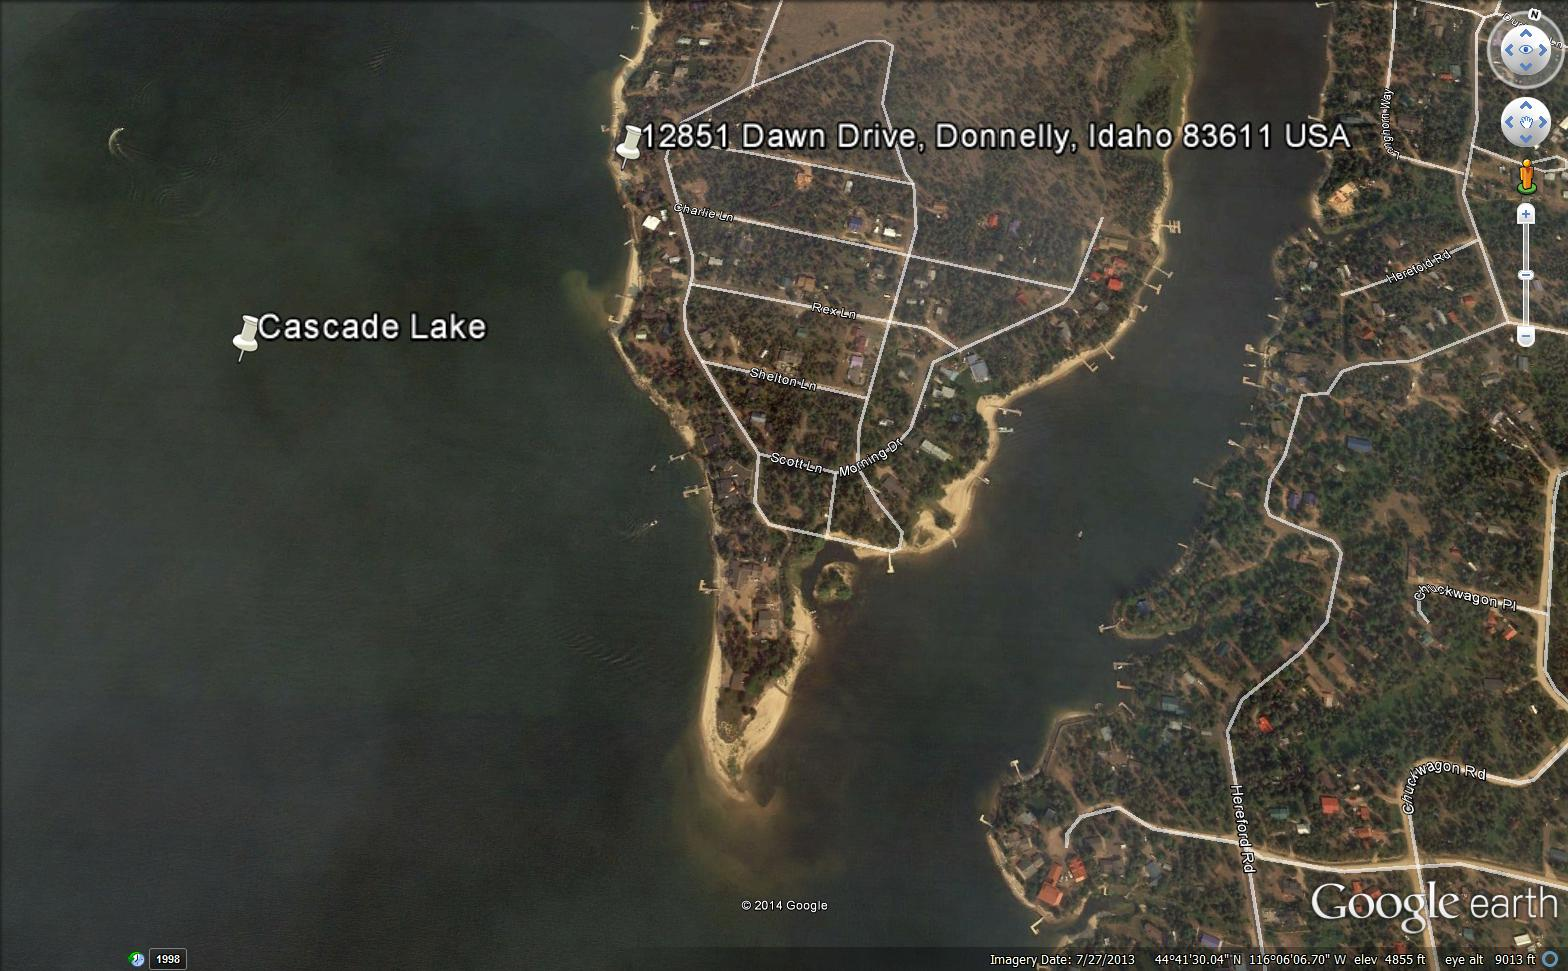 Cascade Lake Realty Bare Land Over K - Kiser lake map